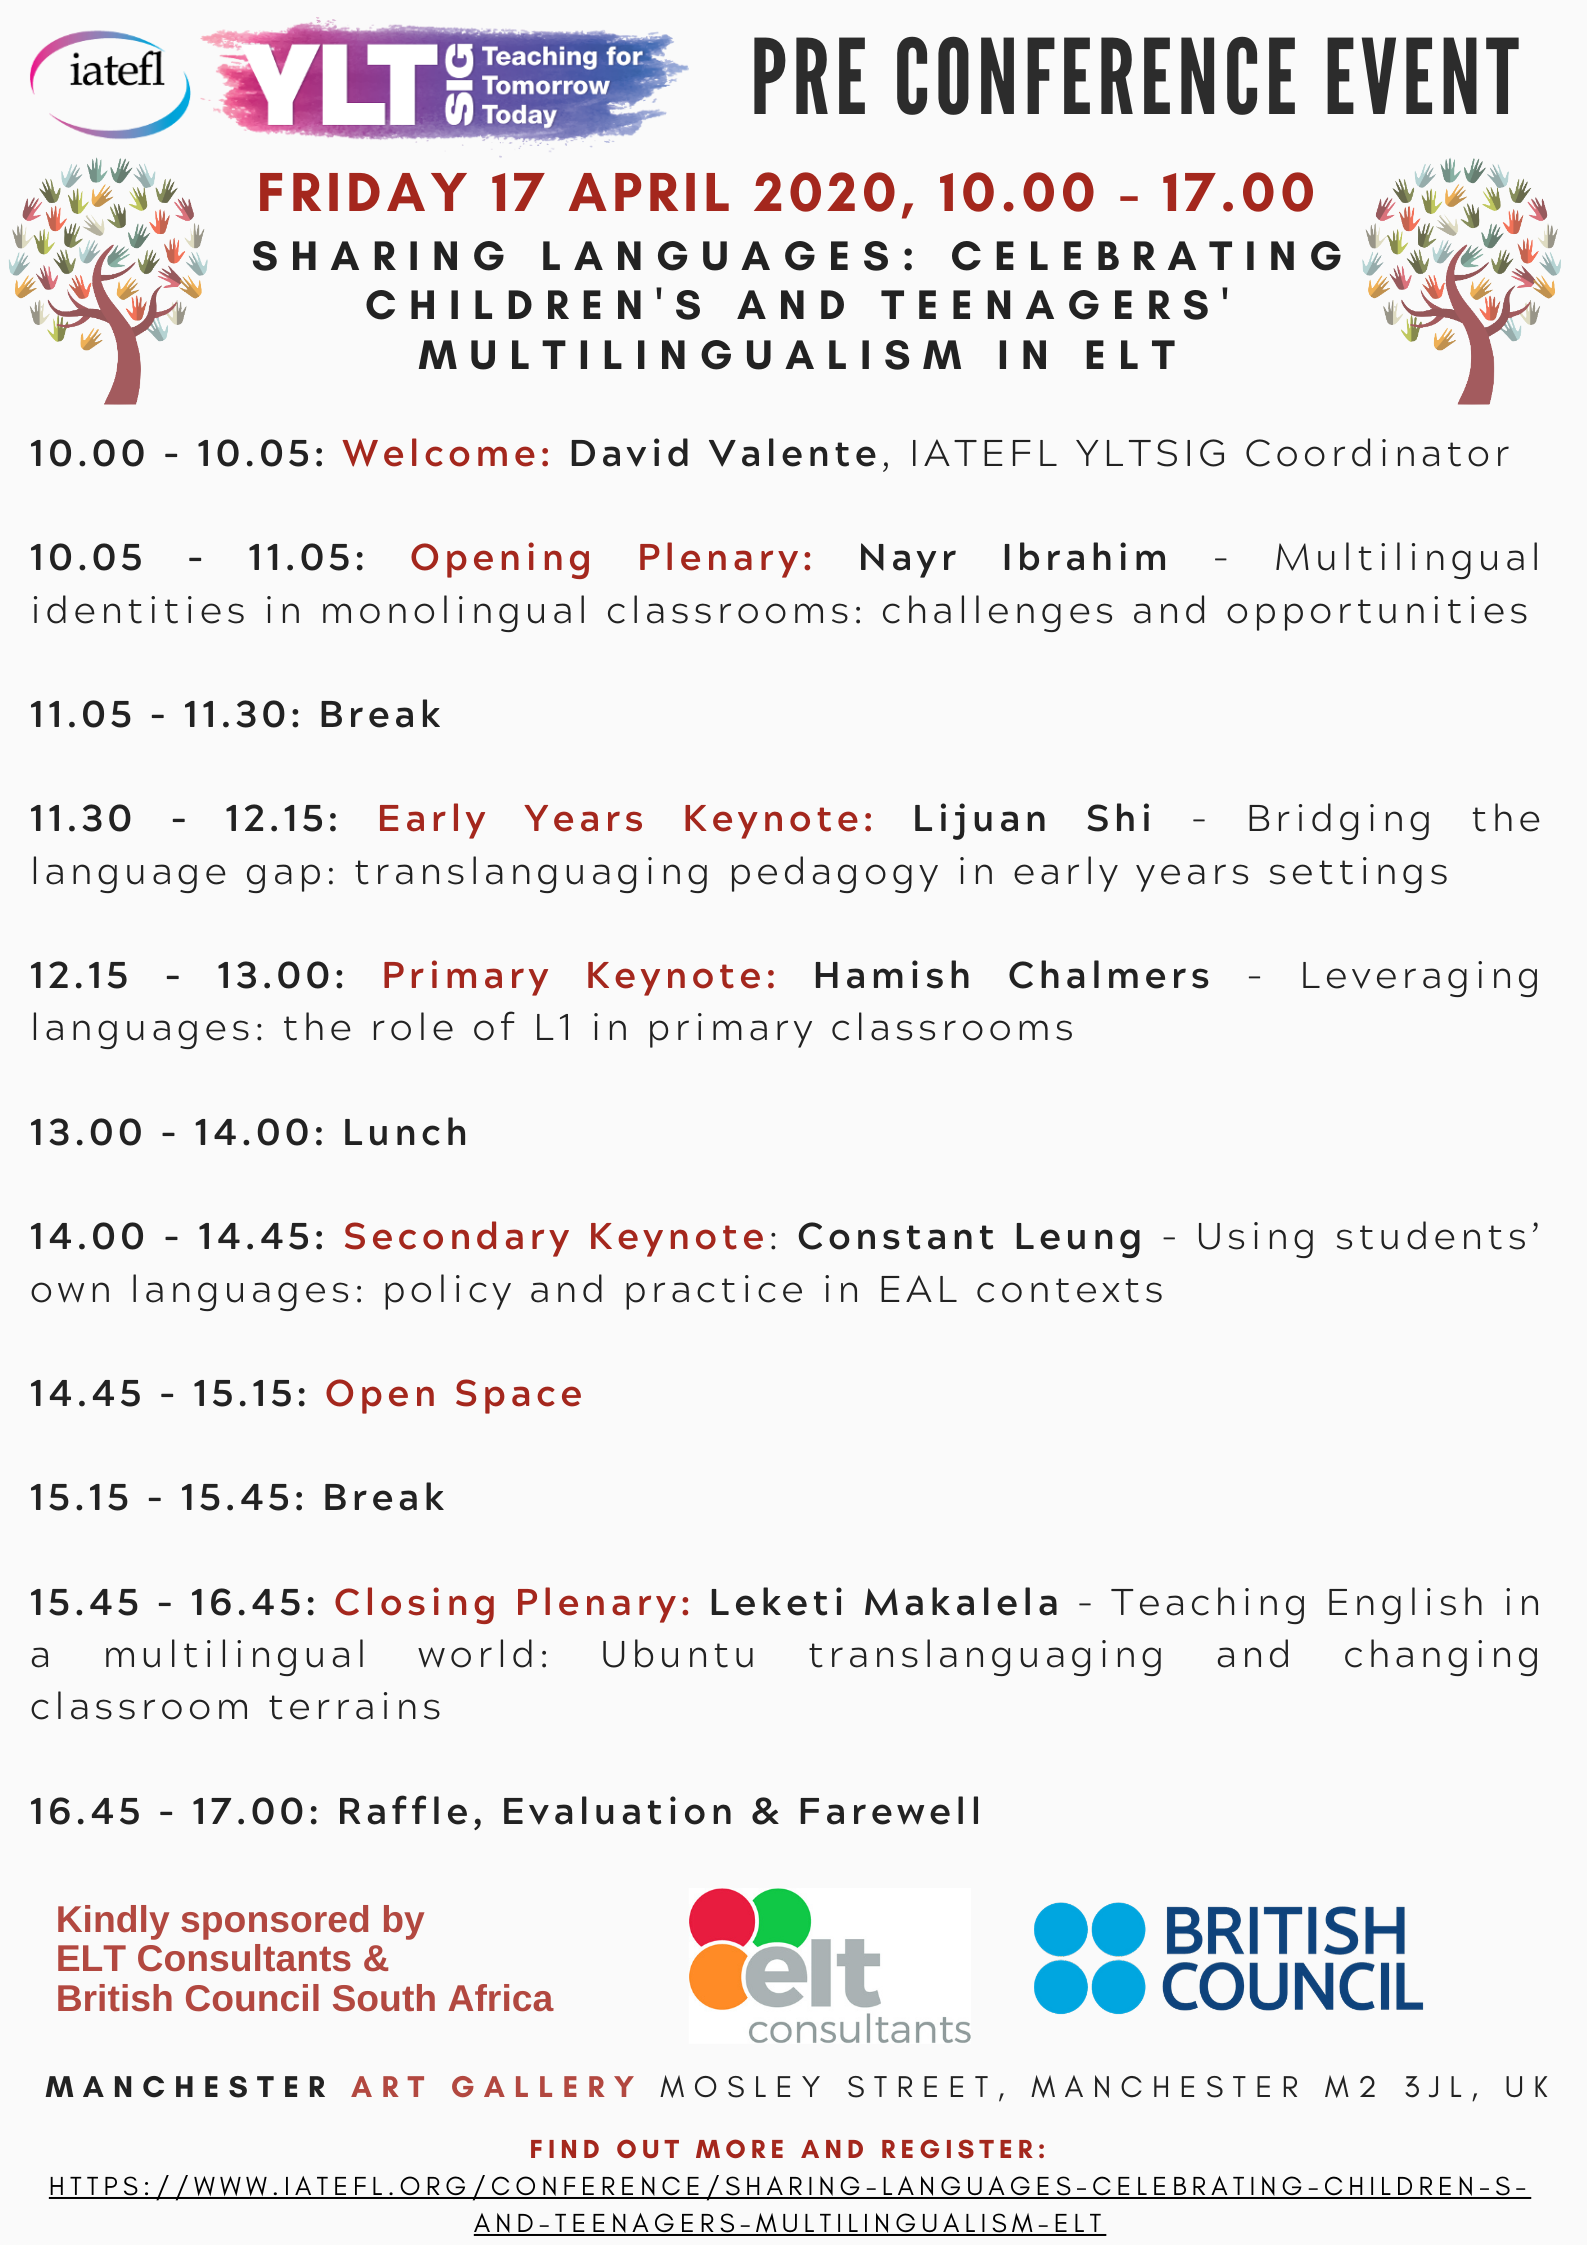 YLTSIG 2020 PCE Programme